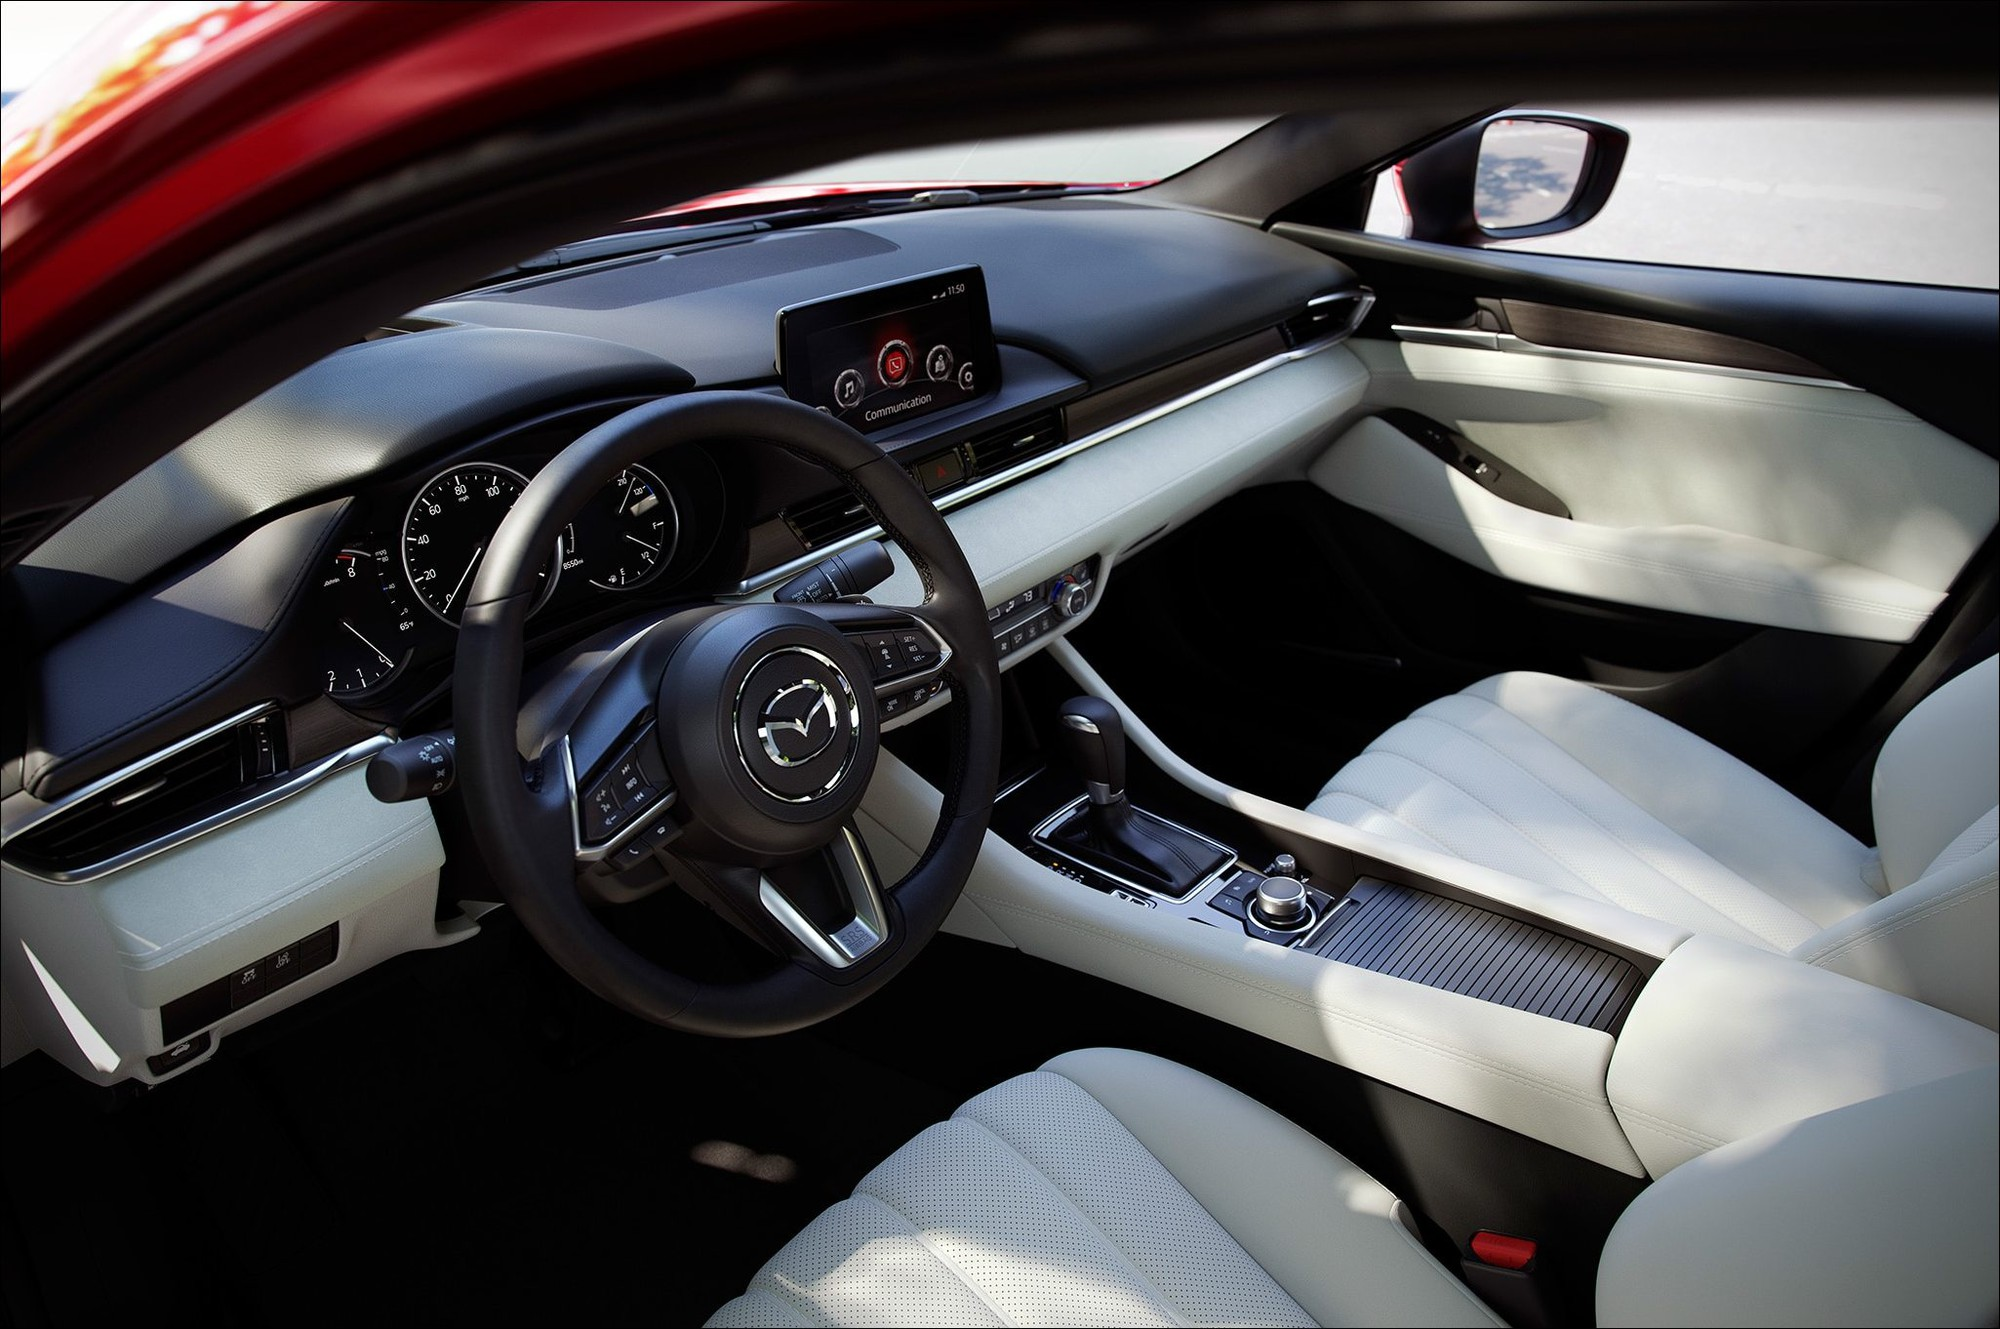 Mazda bổ sung Apple CarPlay và Android Auto cho Mazda6 2018